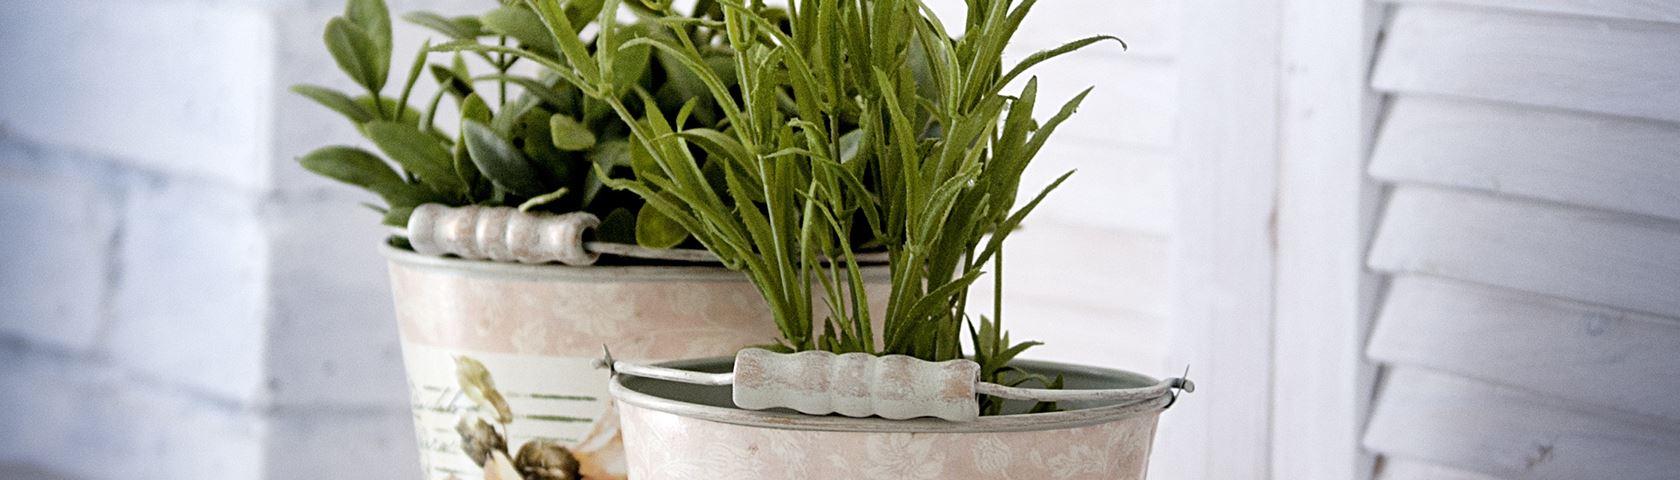 Buckets of Lavender